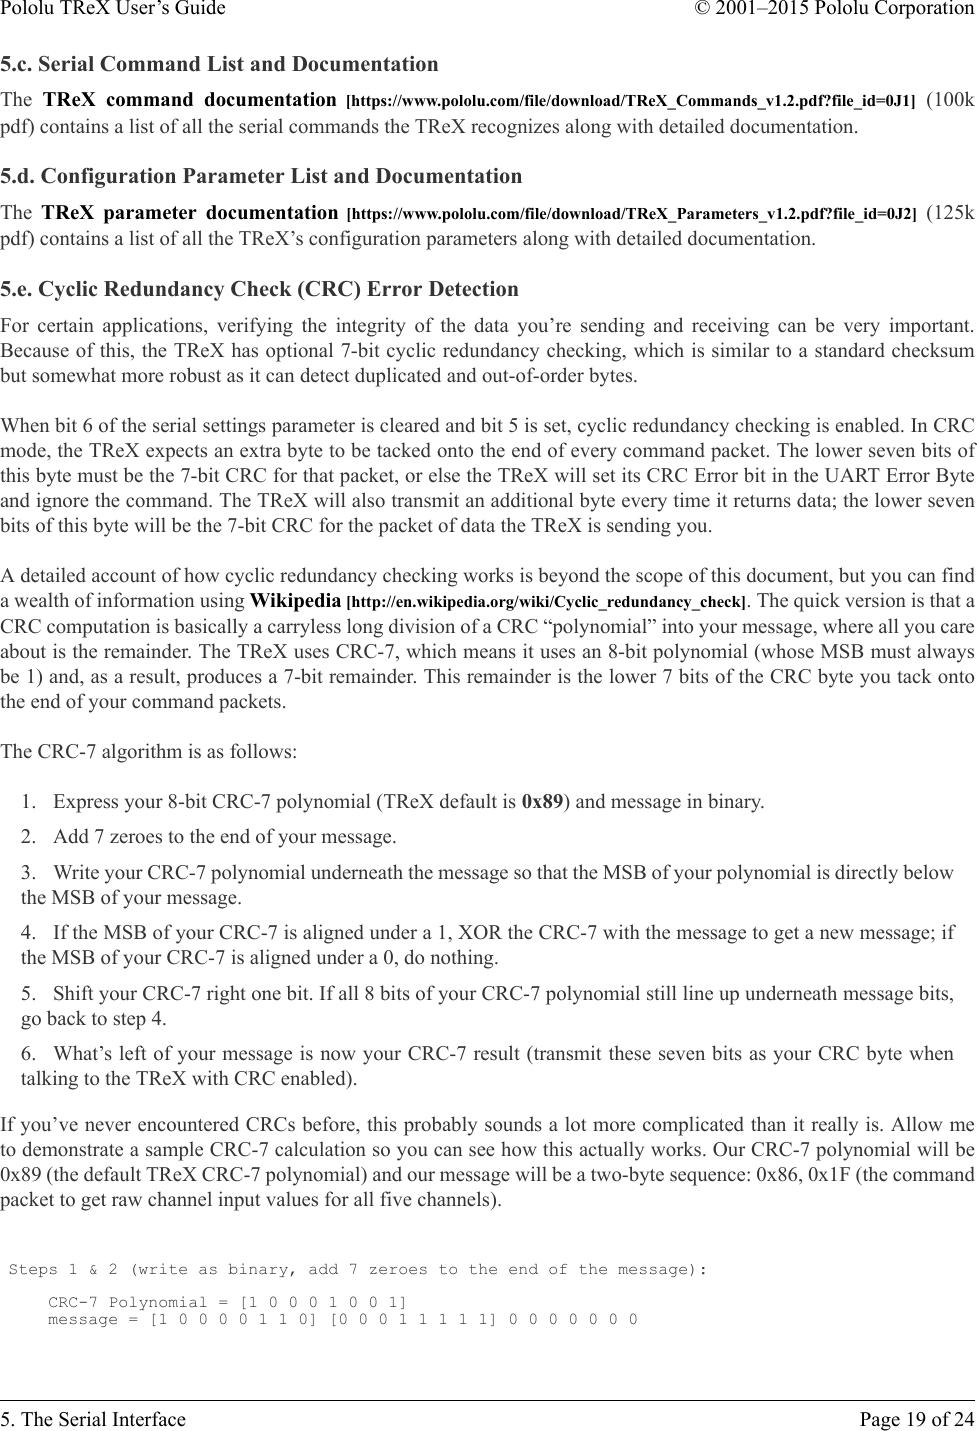 Pololu TReX User's Guide TRe X Manual